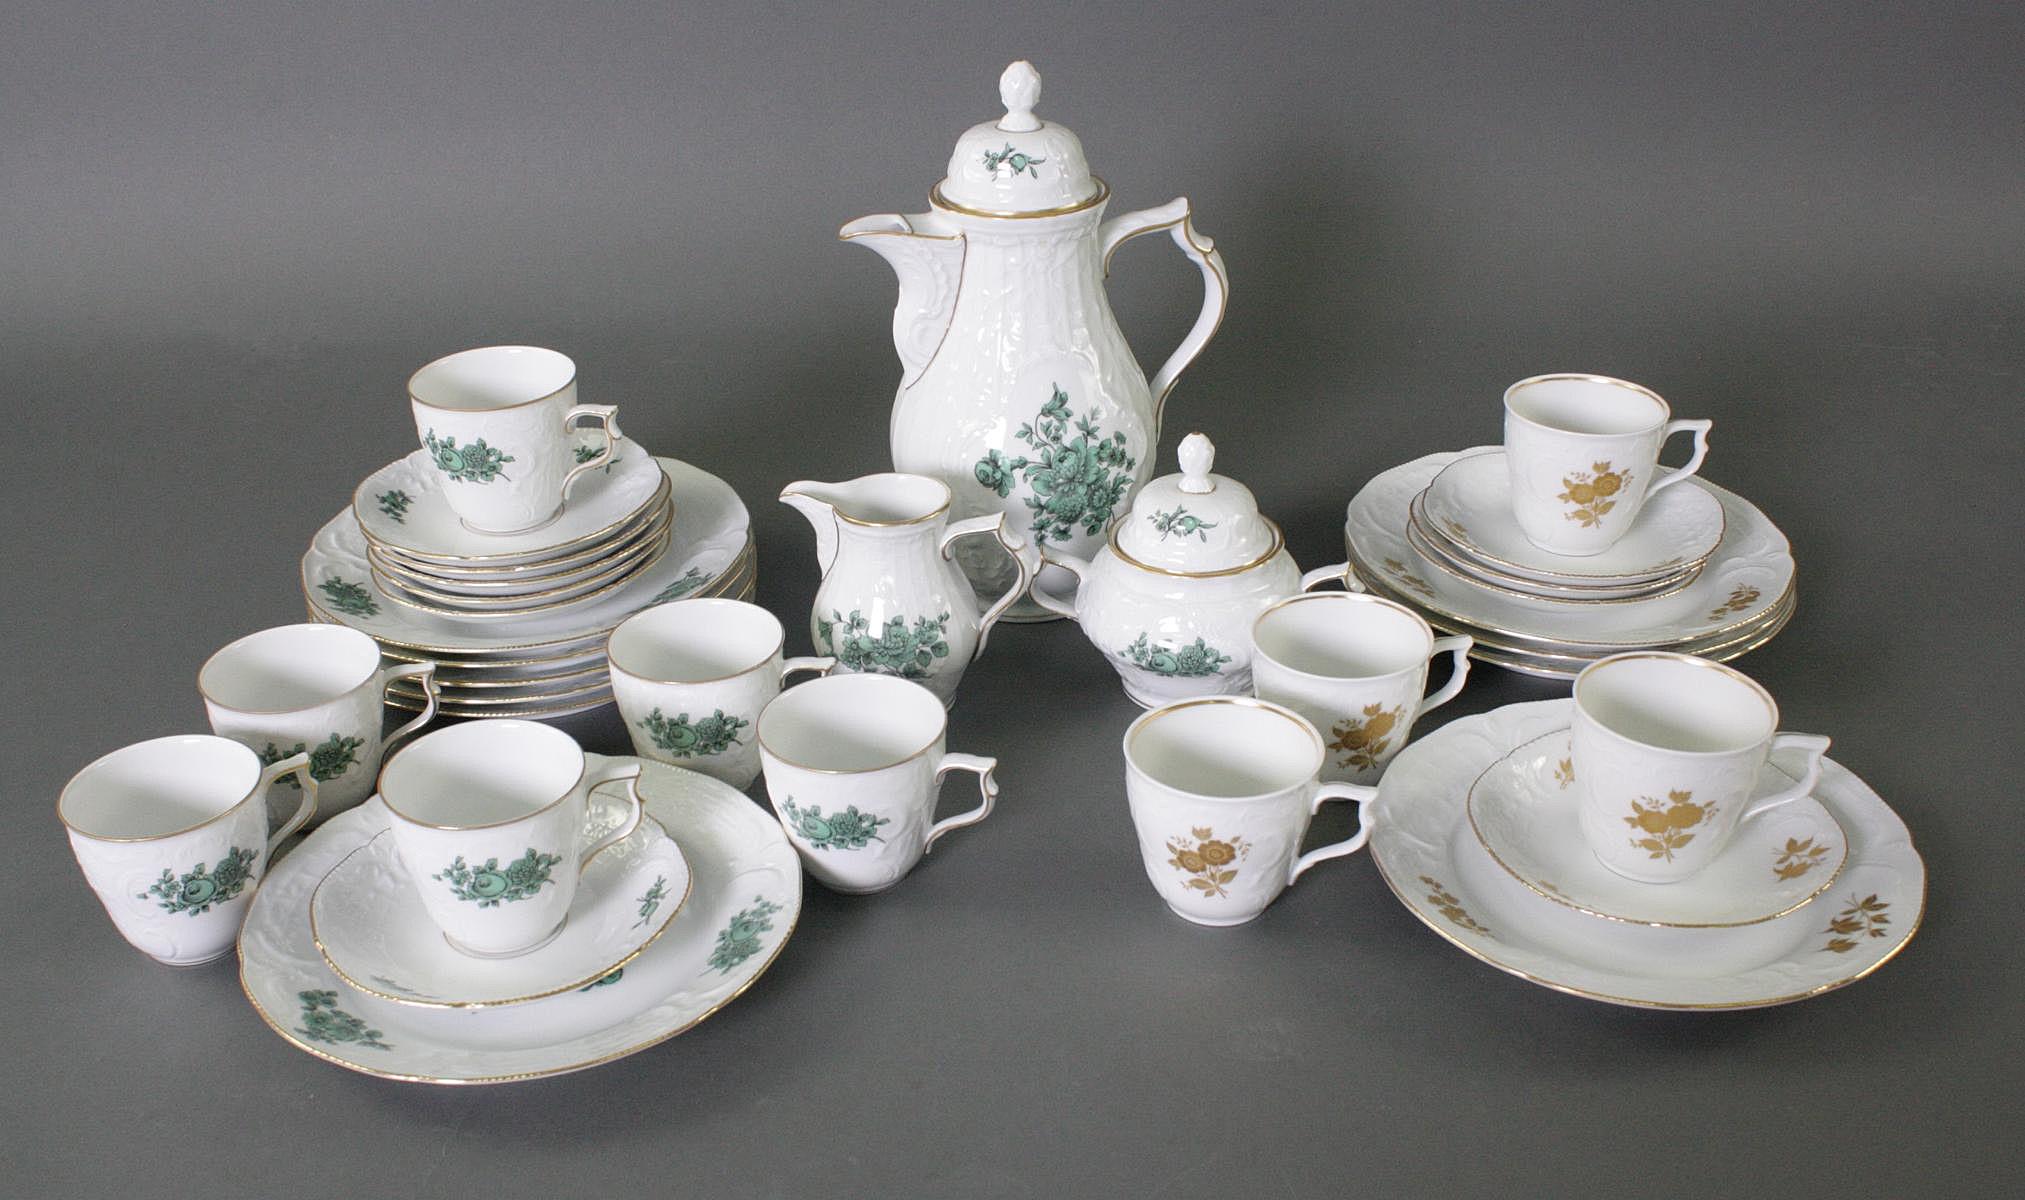 Rosenthal Kaffeeservice, Classic Rose und 4 Gedecke, Sanssouci